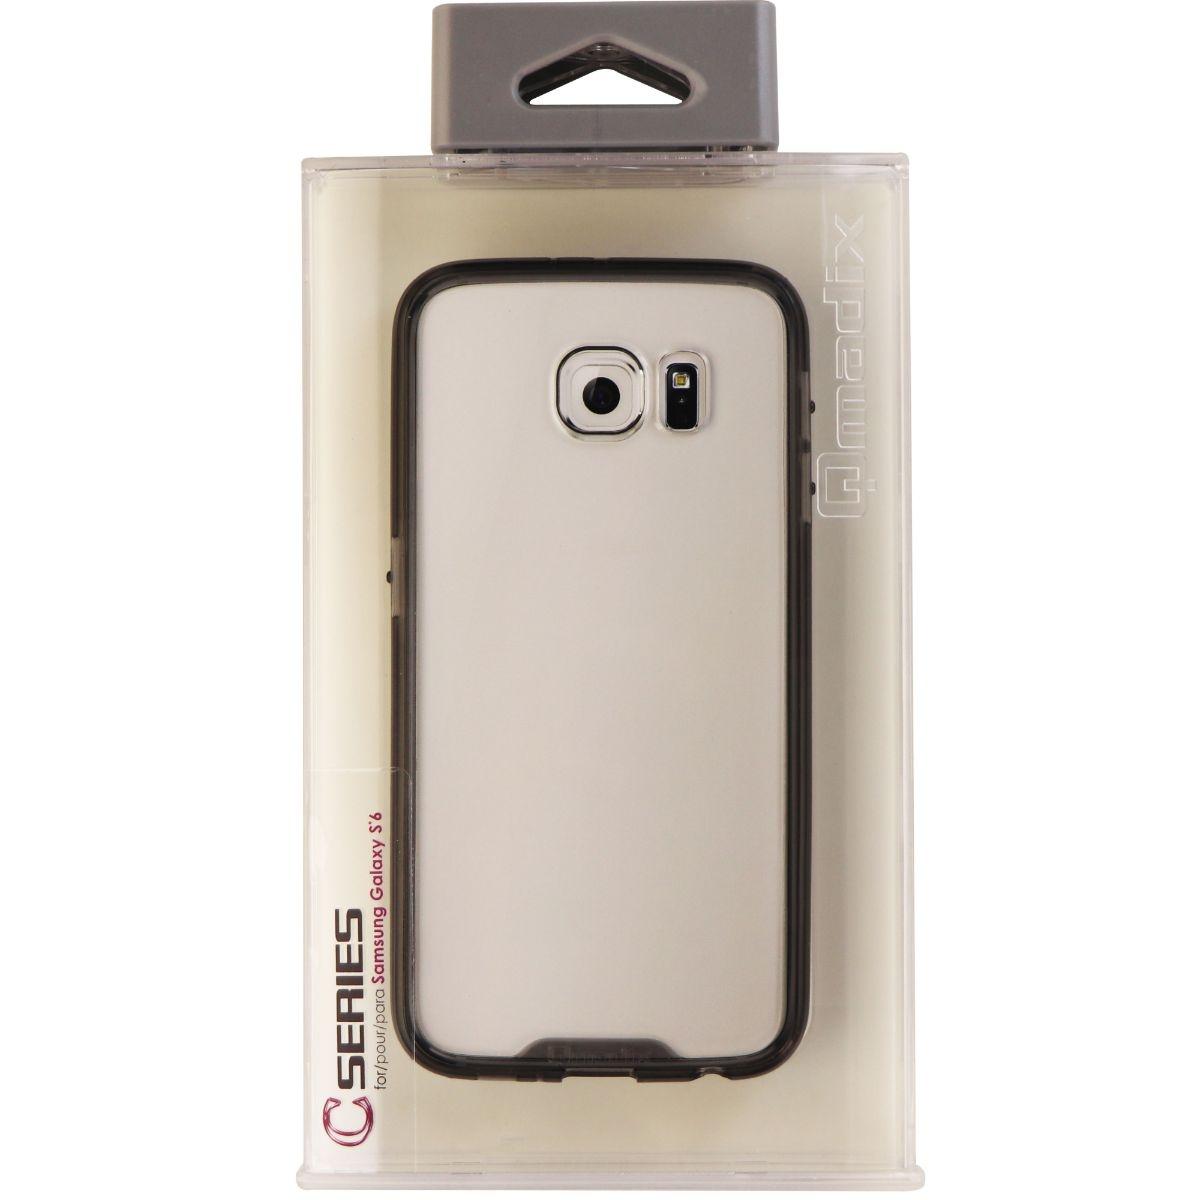 Qmadix C-Series Hybrid Hard Case for Samsung Galaxy S6 - Clear/Smoke Tint